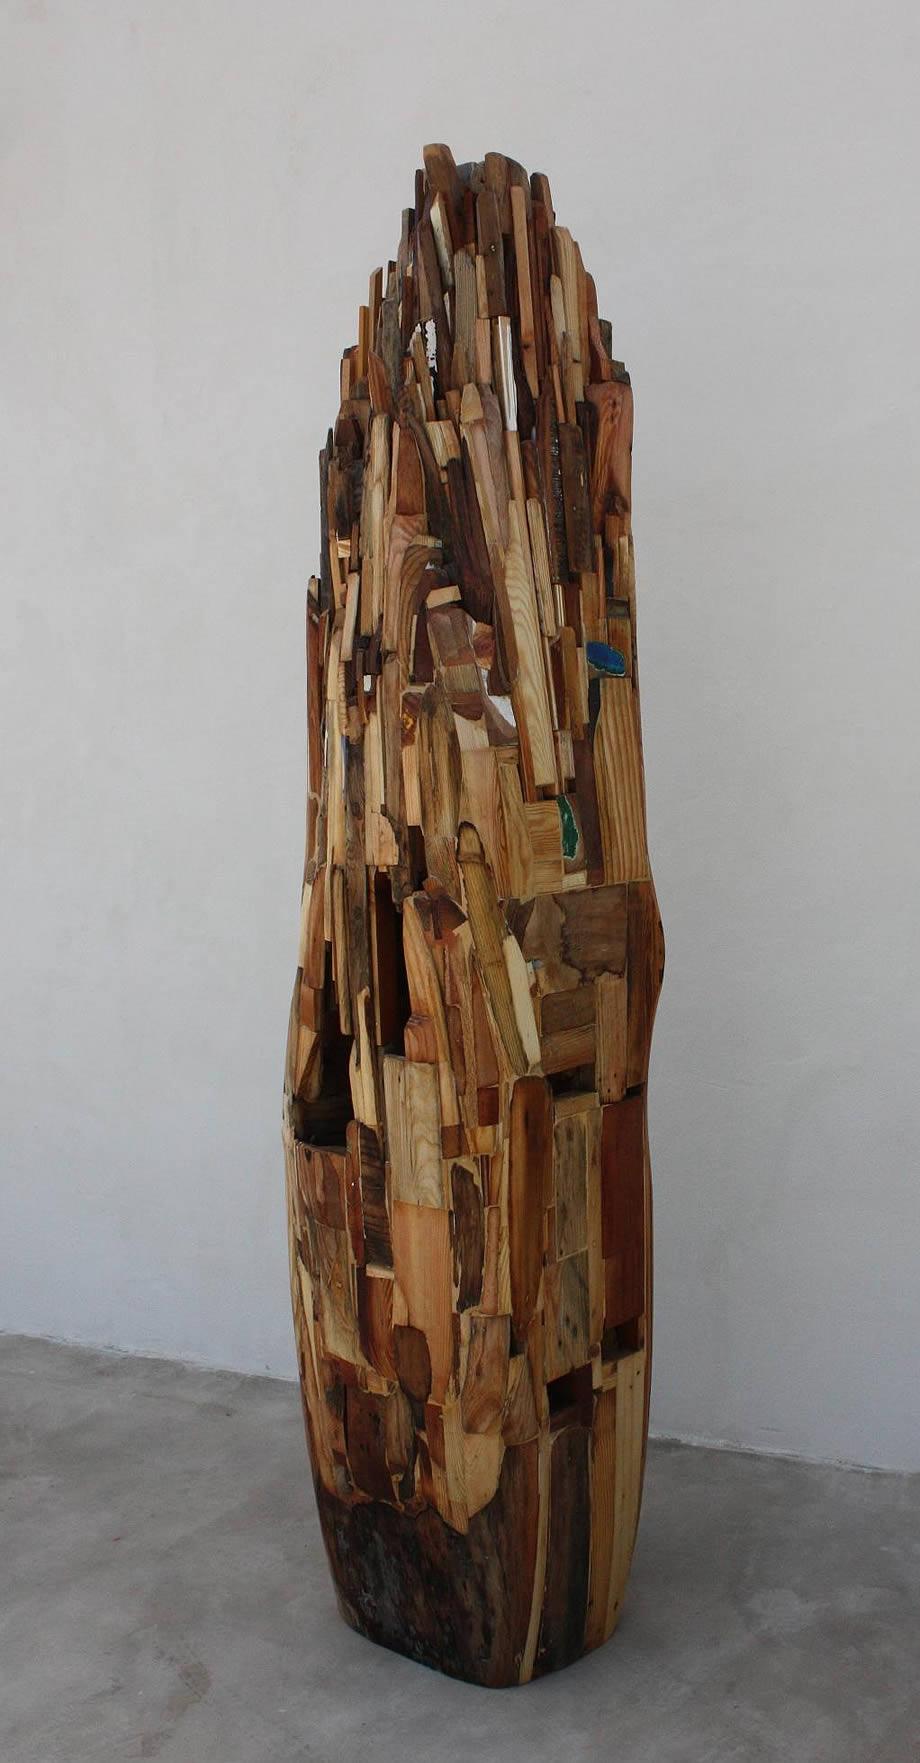 Árbol deconstruido I